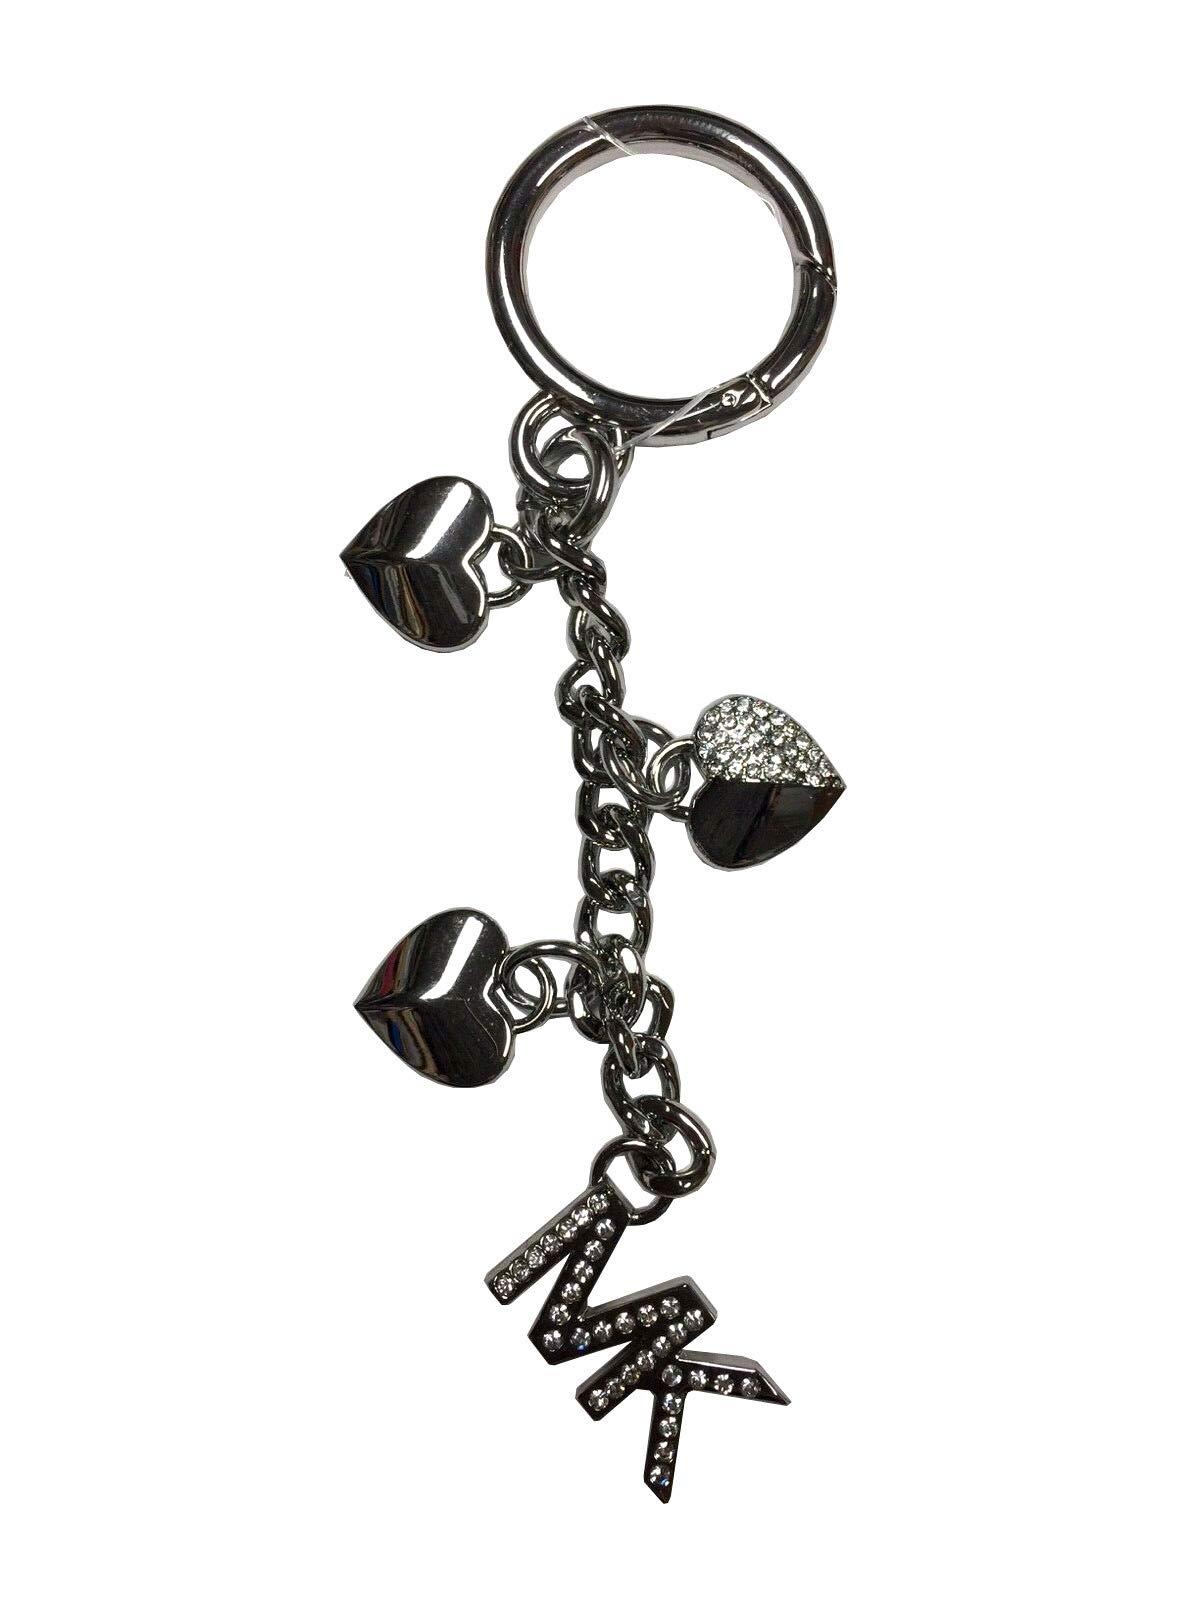 Michael Kors Silver Heart Charms Pave Studded Key Fob Charms by Michael Kors